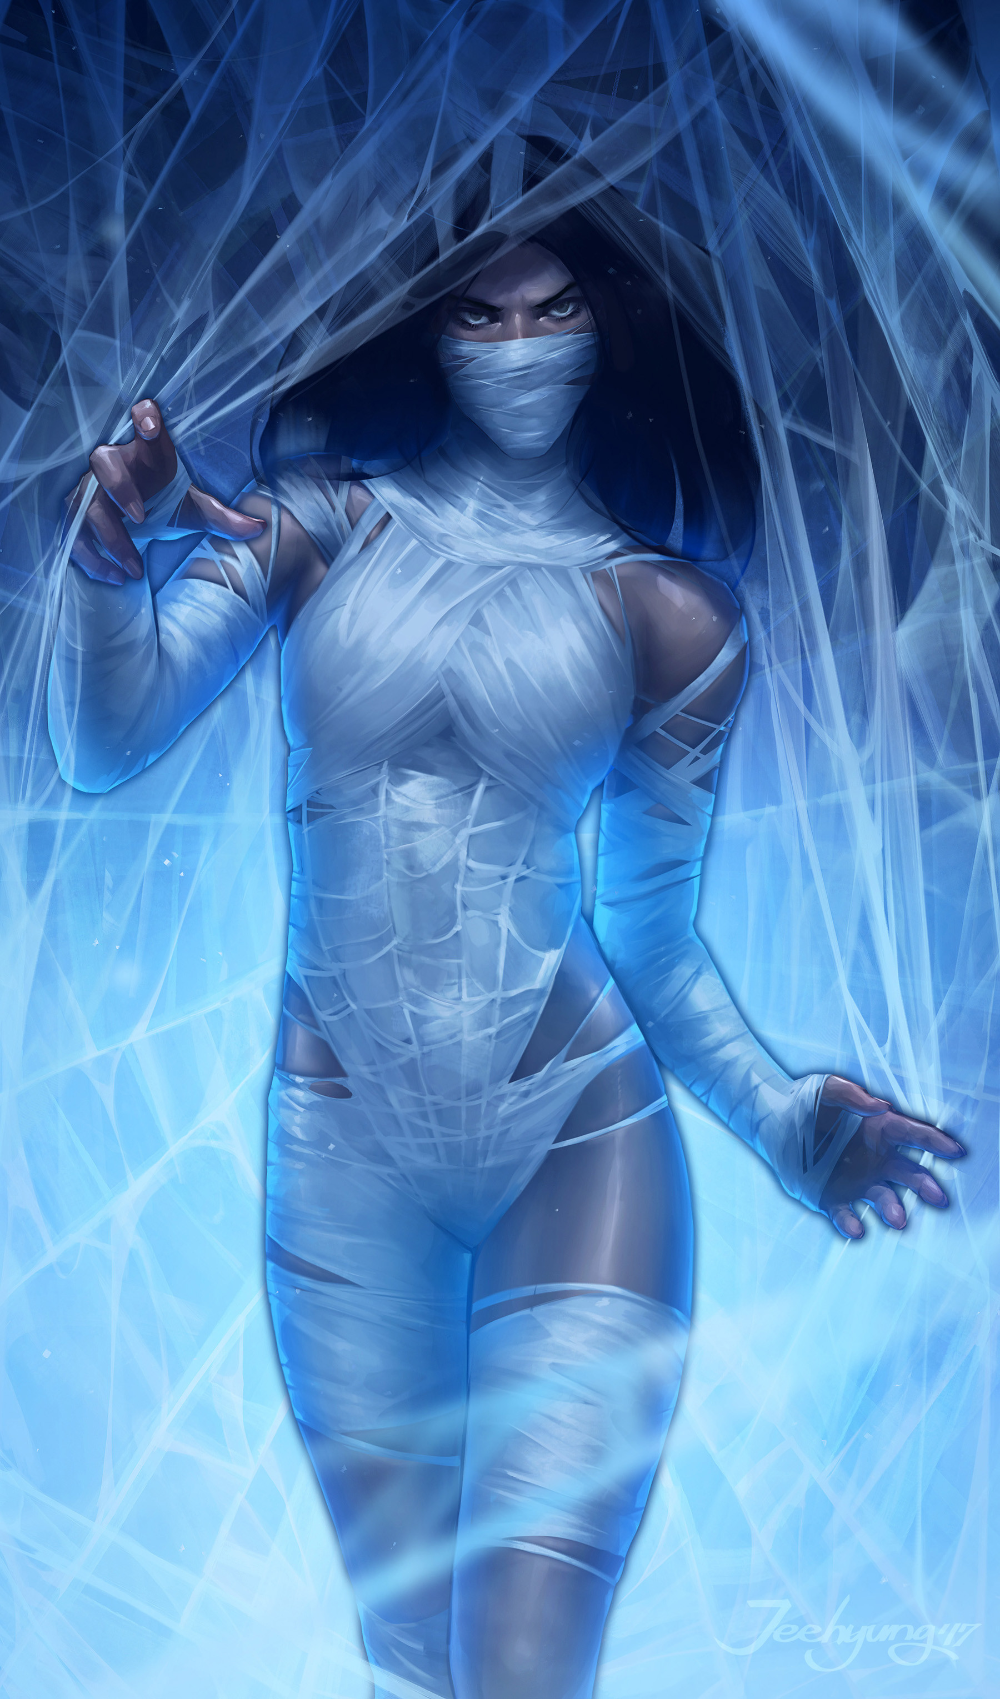 ArtStation - silk, JeeHyung lee in 2020 | Silk marvel, Marvel girls, Comics girls